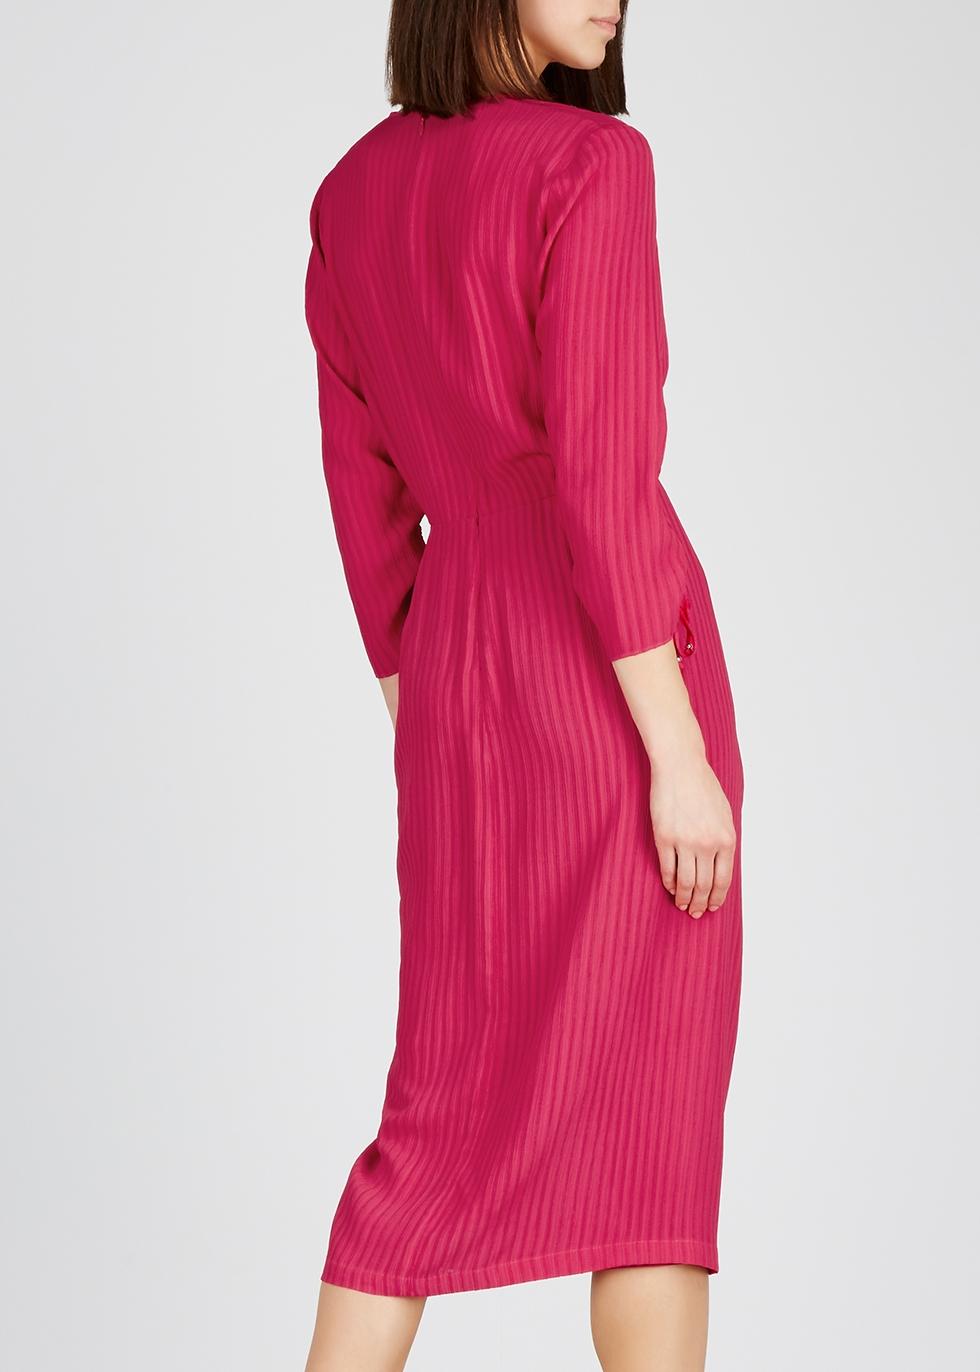 Oriana raspberry ruched midi dress - Altuzarra